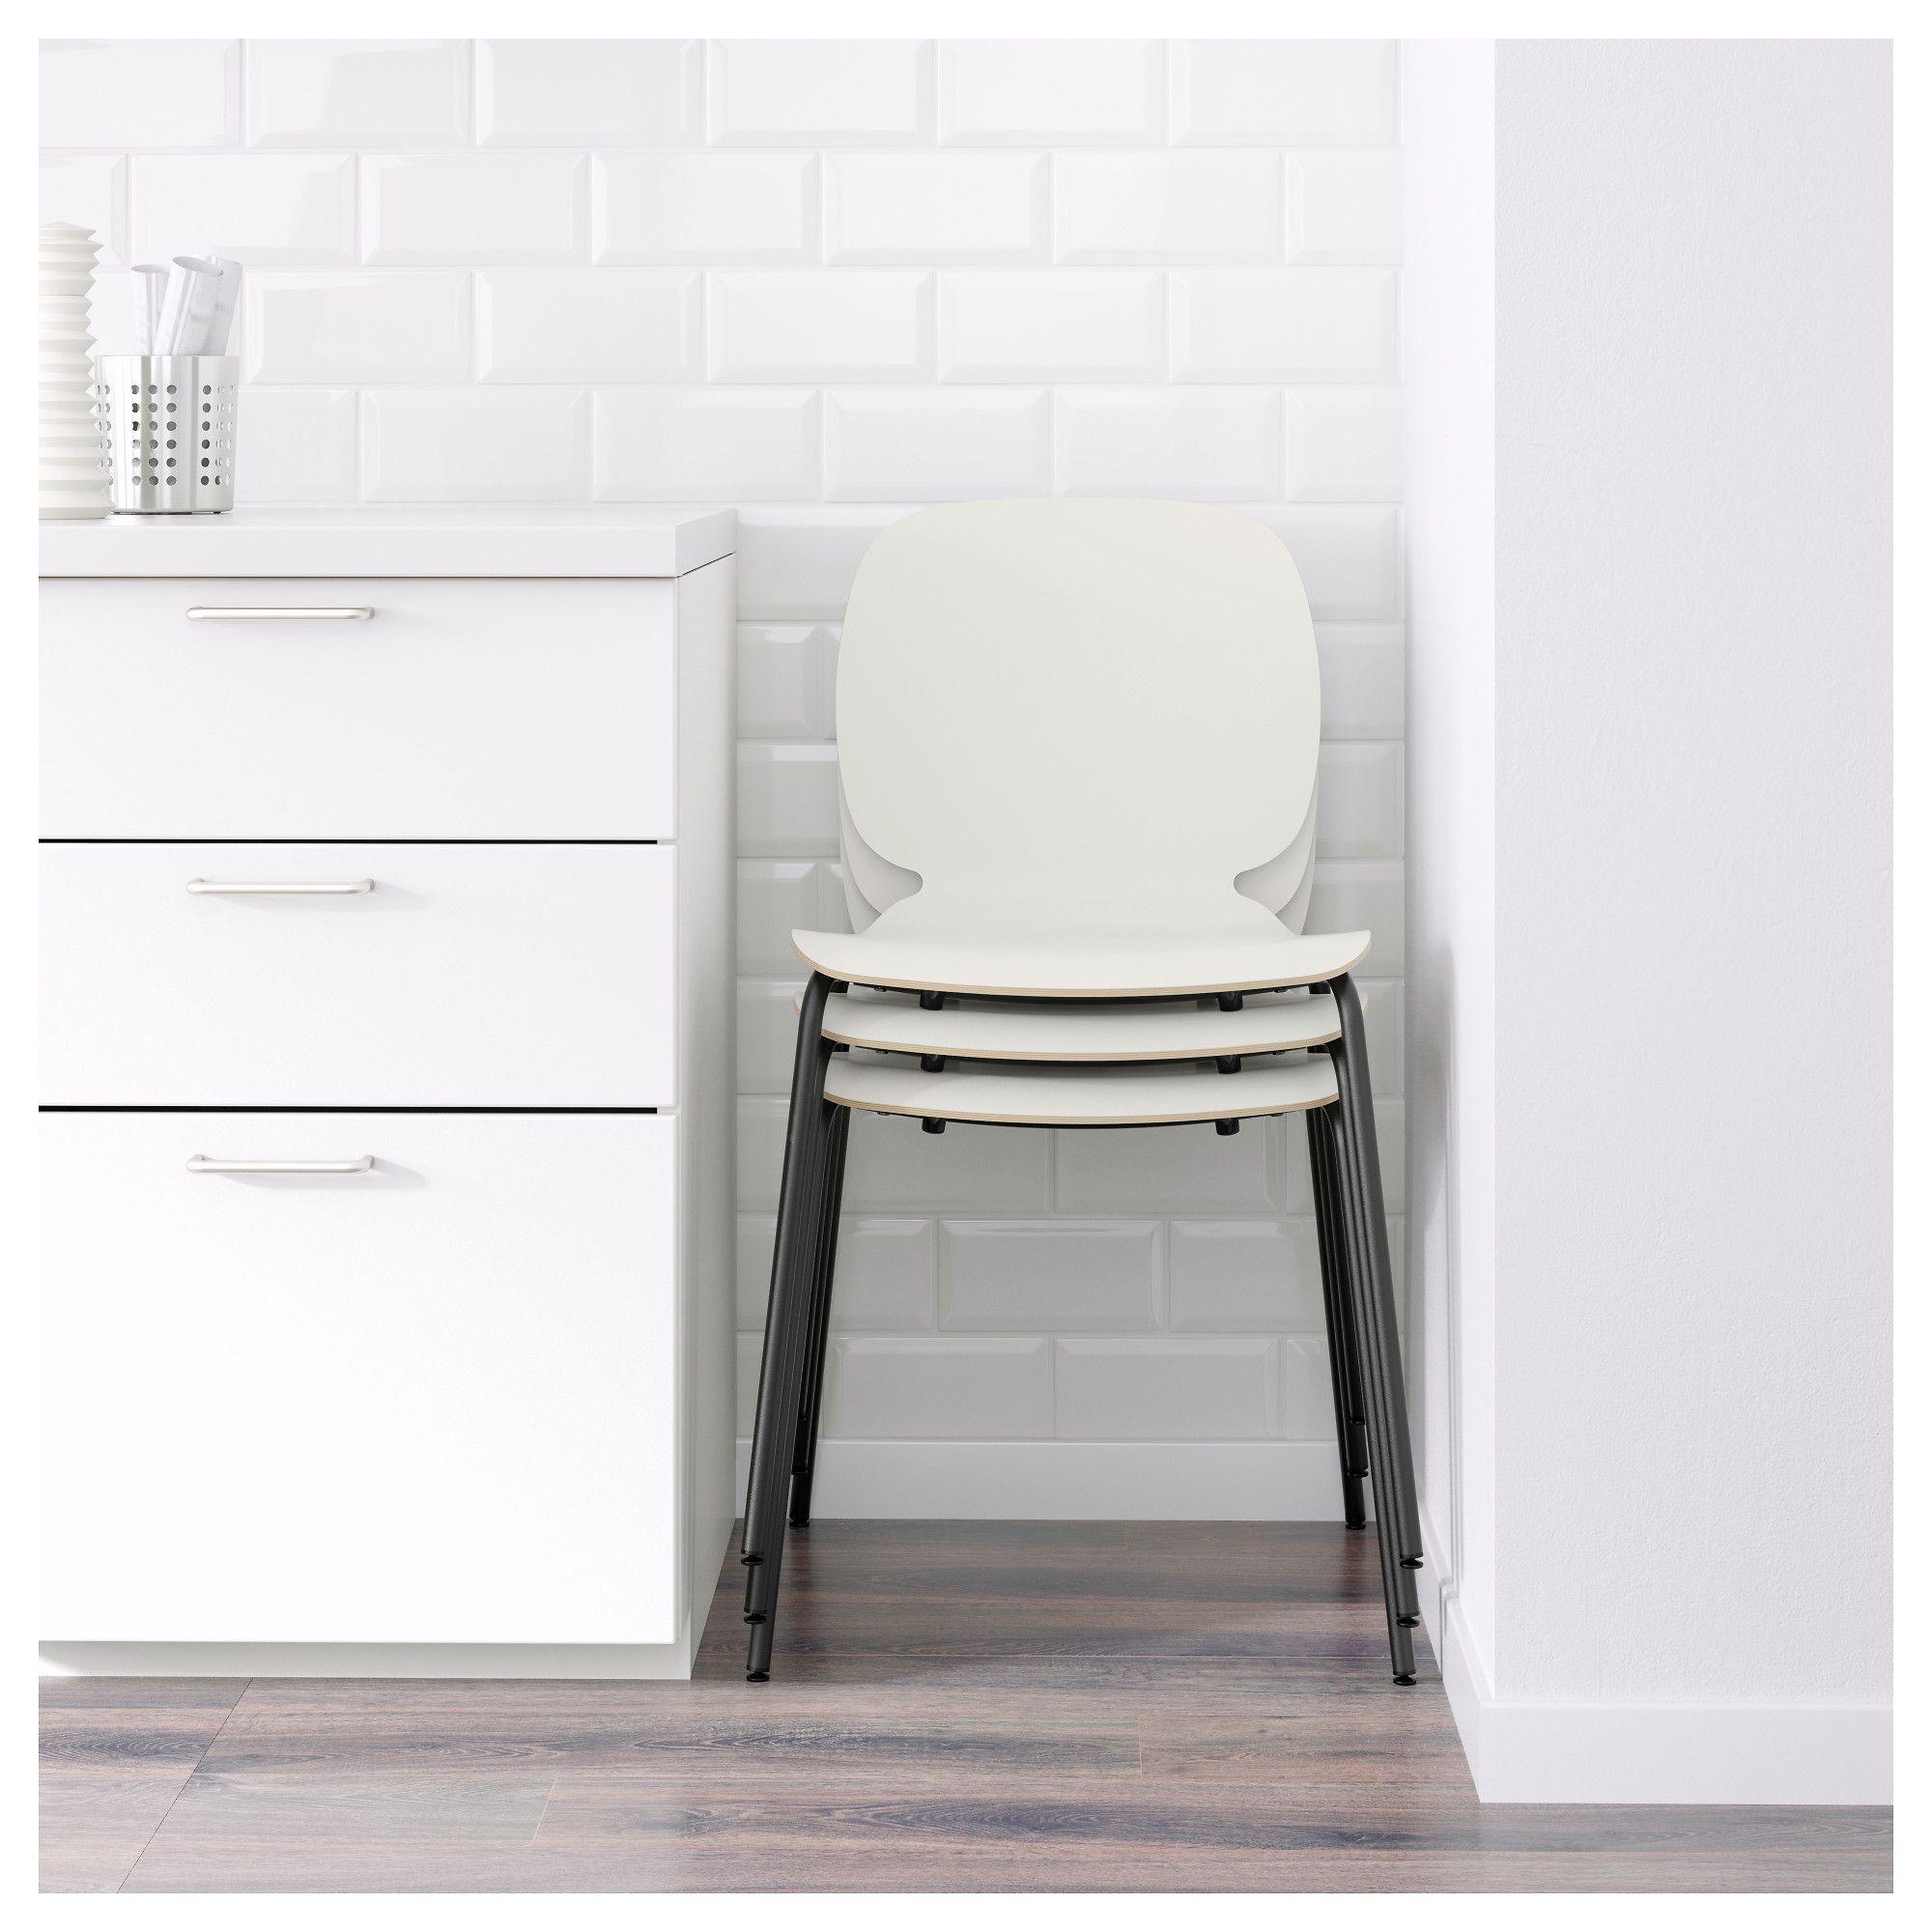 IKEA SVENBERTIL Chair white, Broringe black Ikea chair